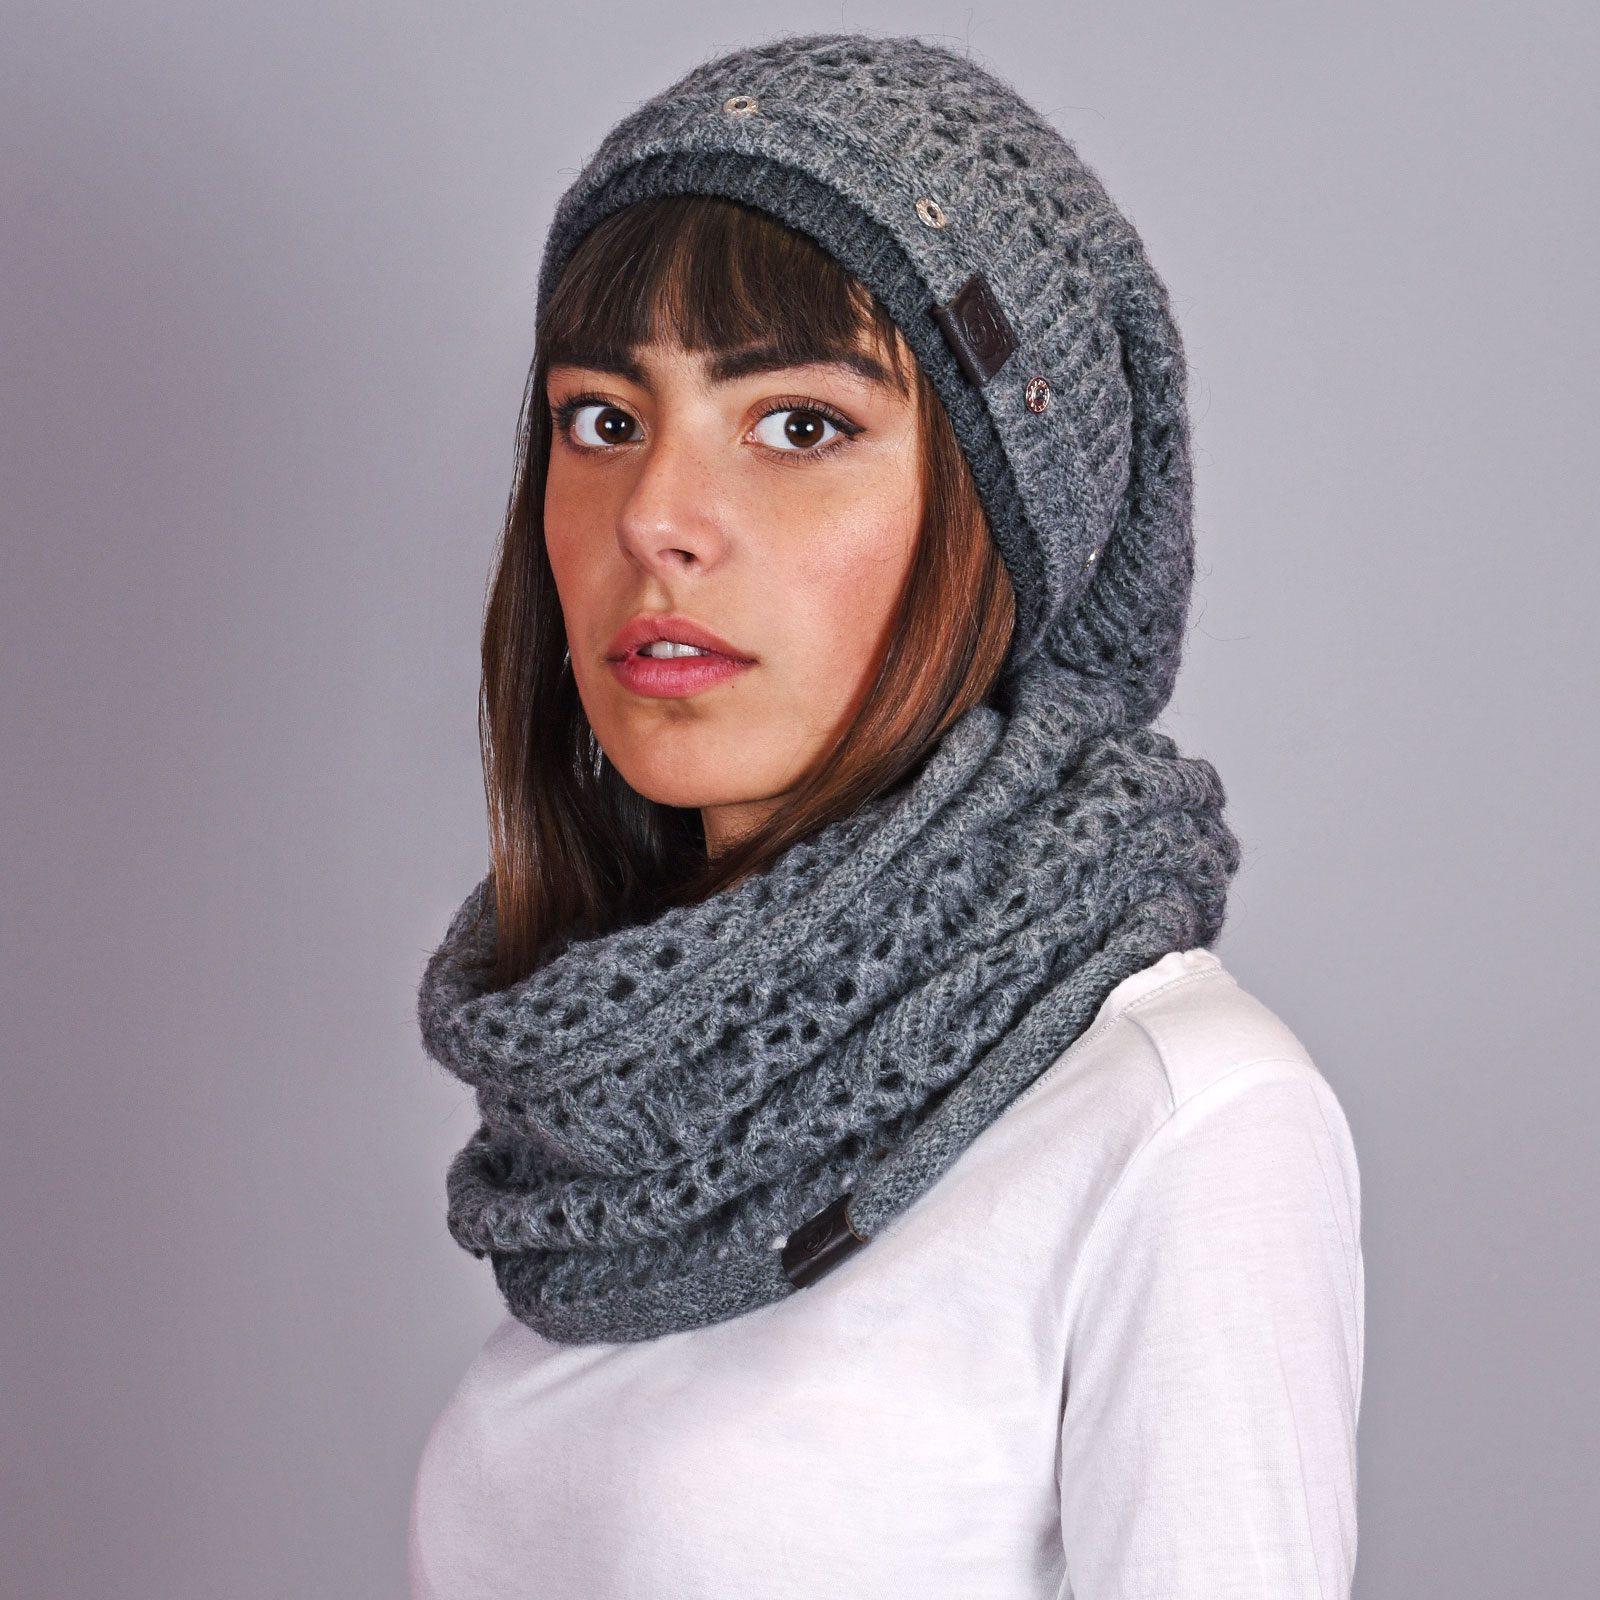 http://lookbook.allee-du-foulard.fr/wp-content/uploads/2019/01/AT-04592-VF16-1600x1600.jpg